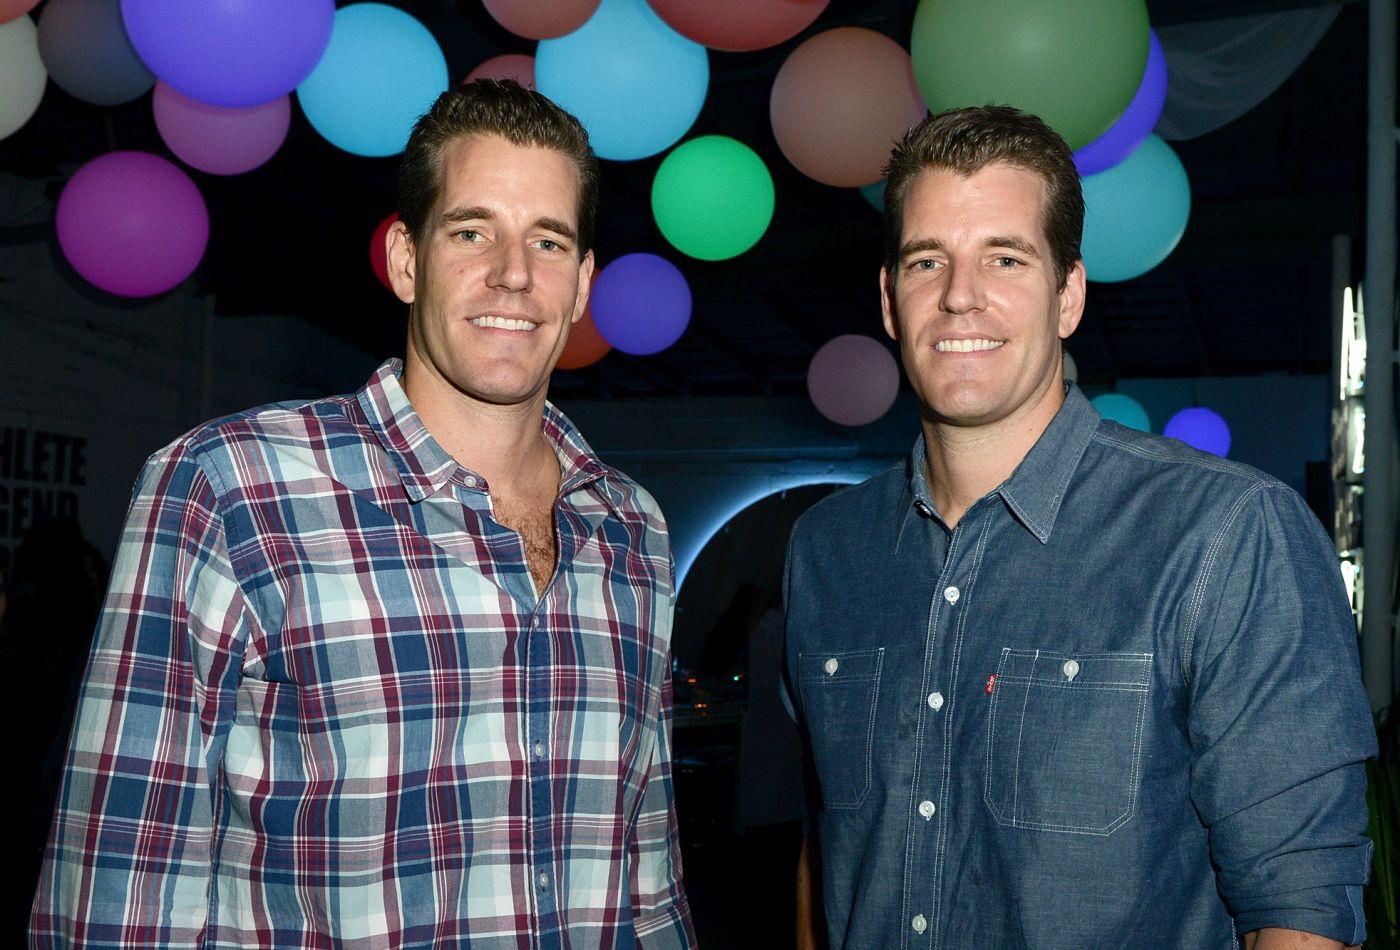 Winklevoss Twins' Gemini Exchange Now Has a New Custodial Service